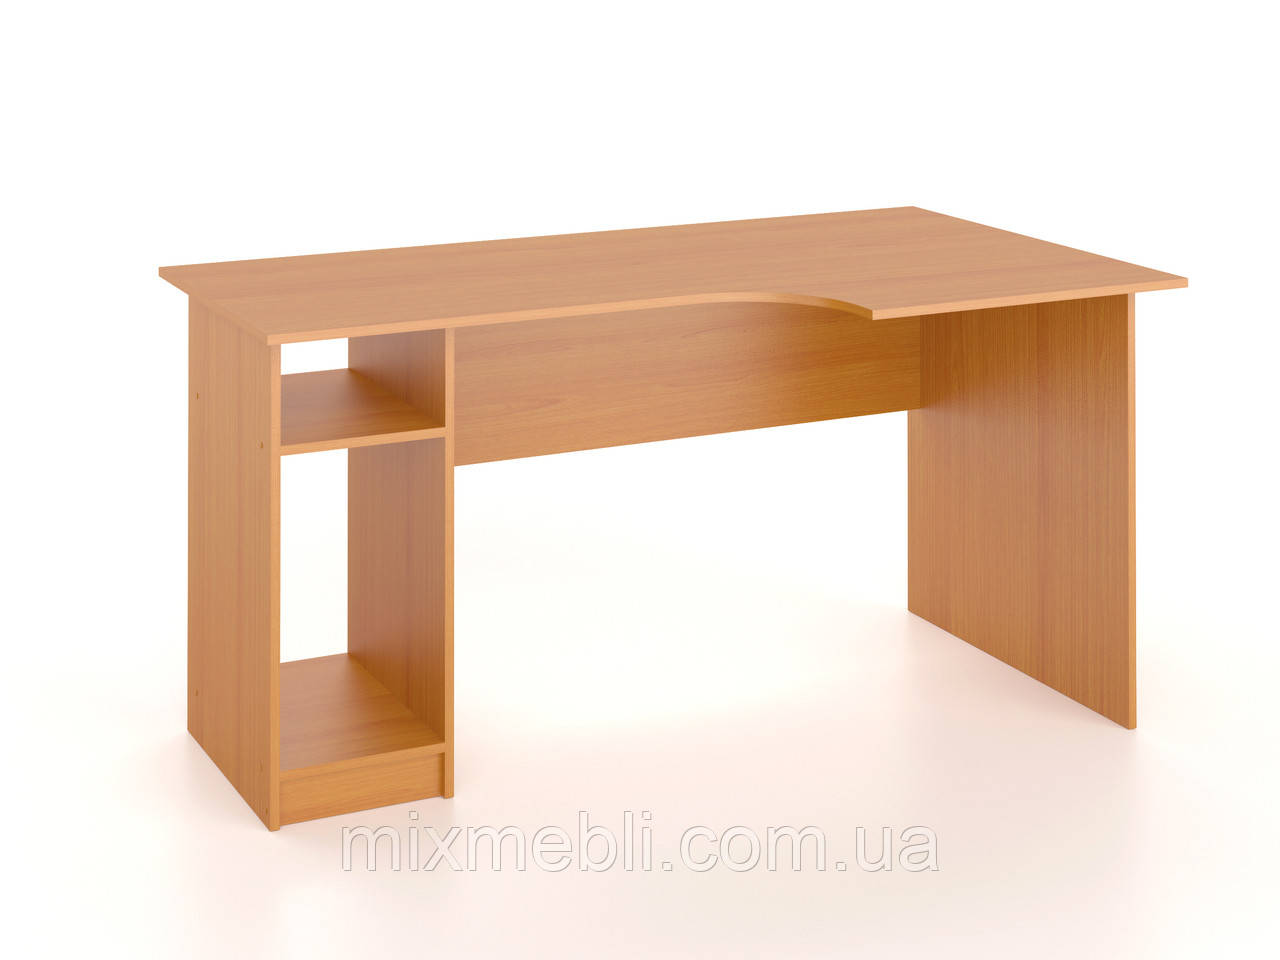 Арт стіл СТ-302